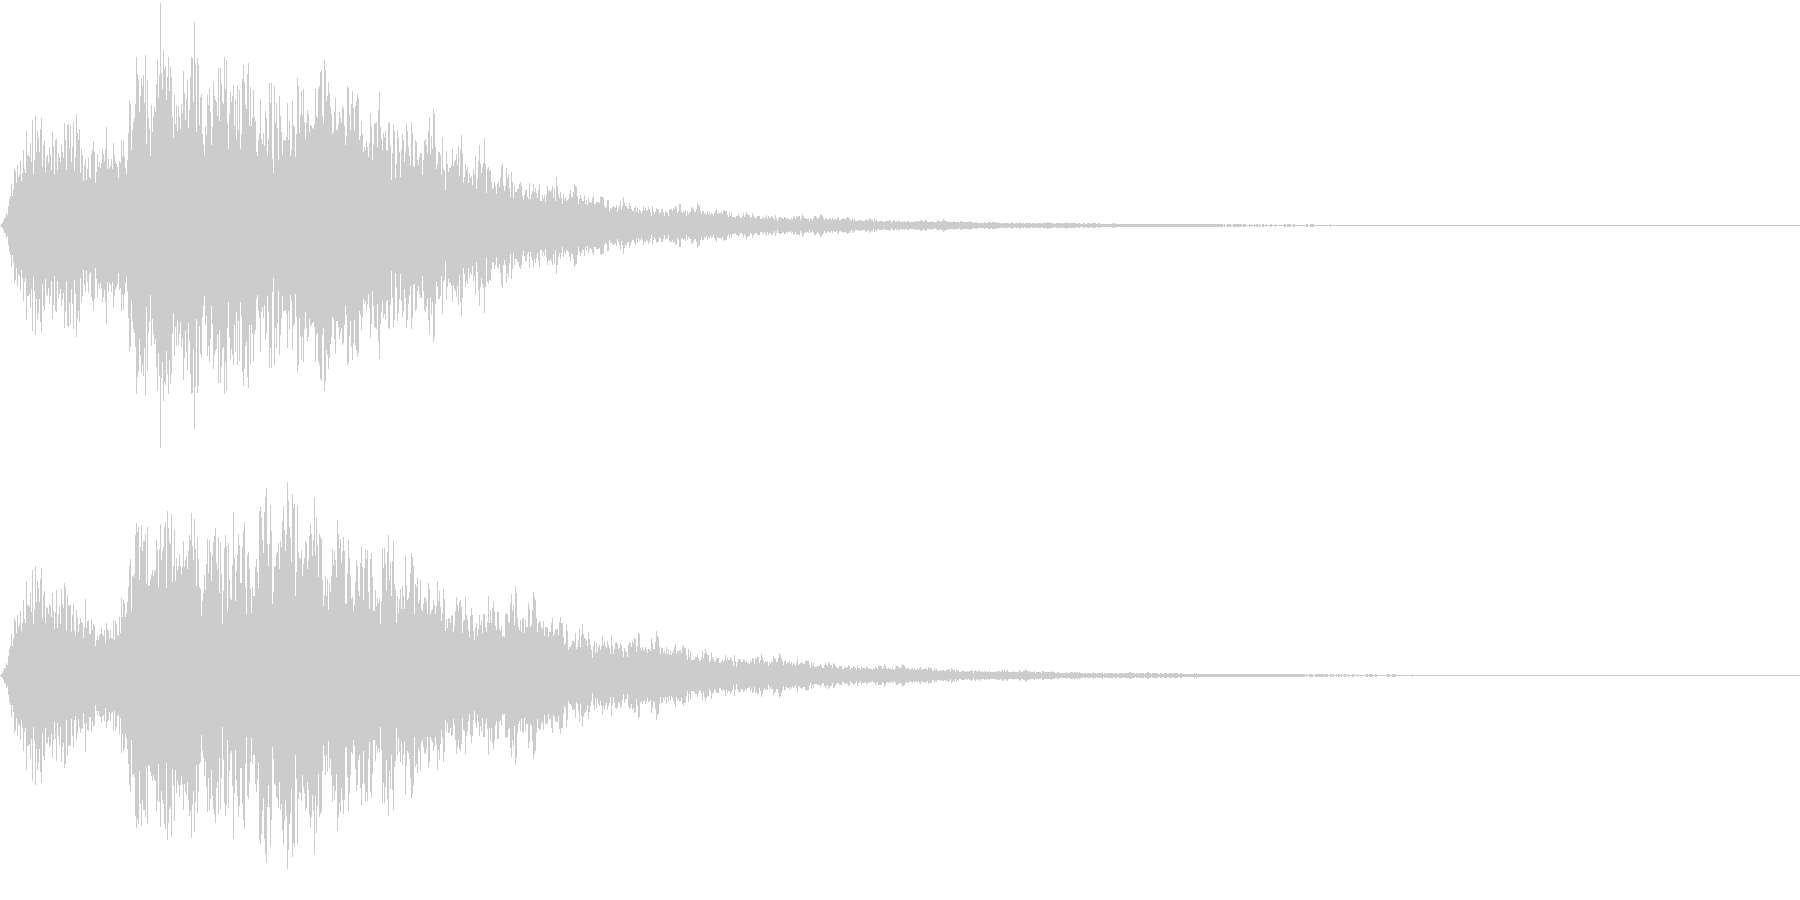 EMail 送受信音 ガラケー風 映像用の未再生の波形